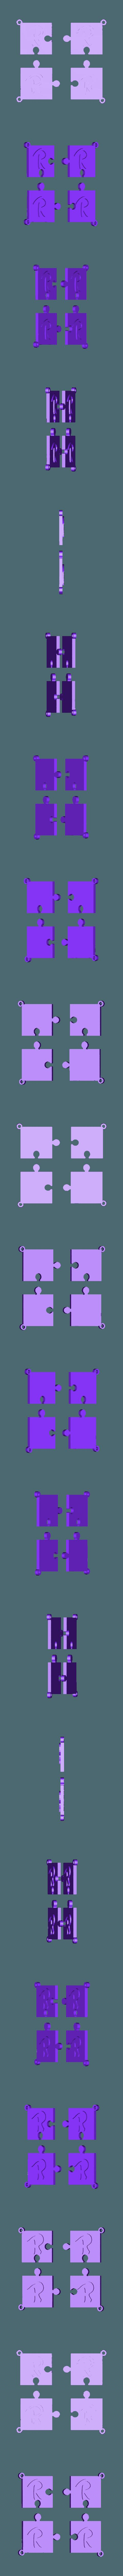 puzzle r.stl Download STL file puzzle key ring • 3D printing design, catf3d